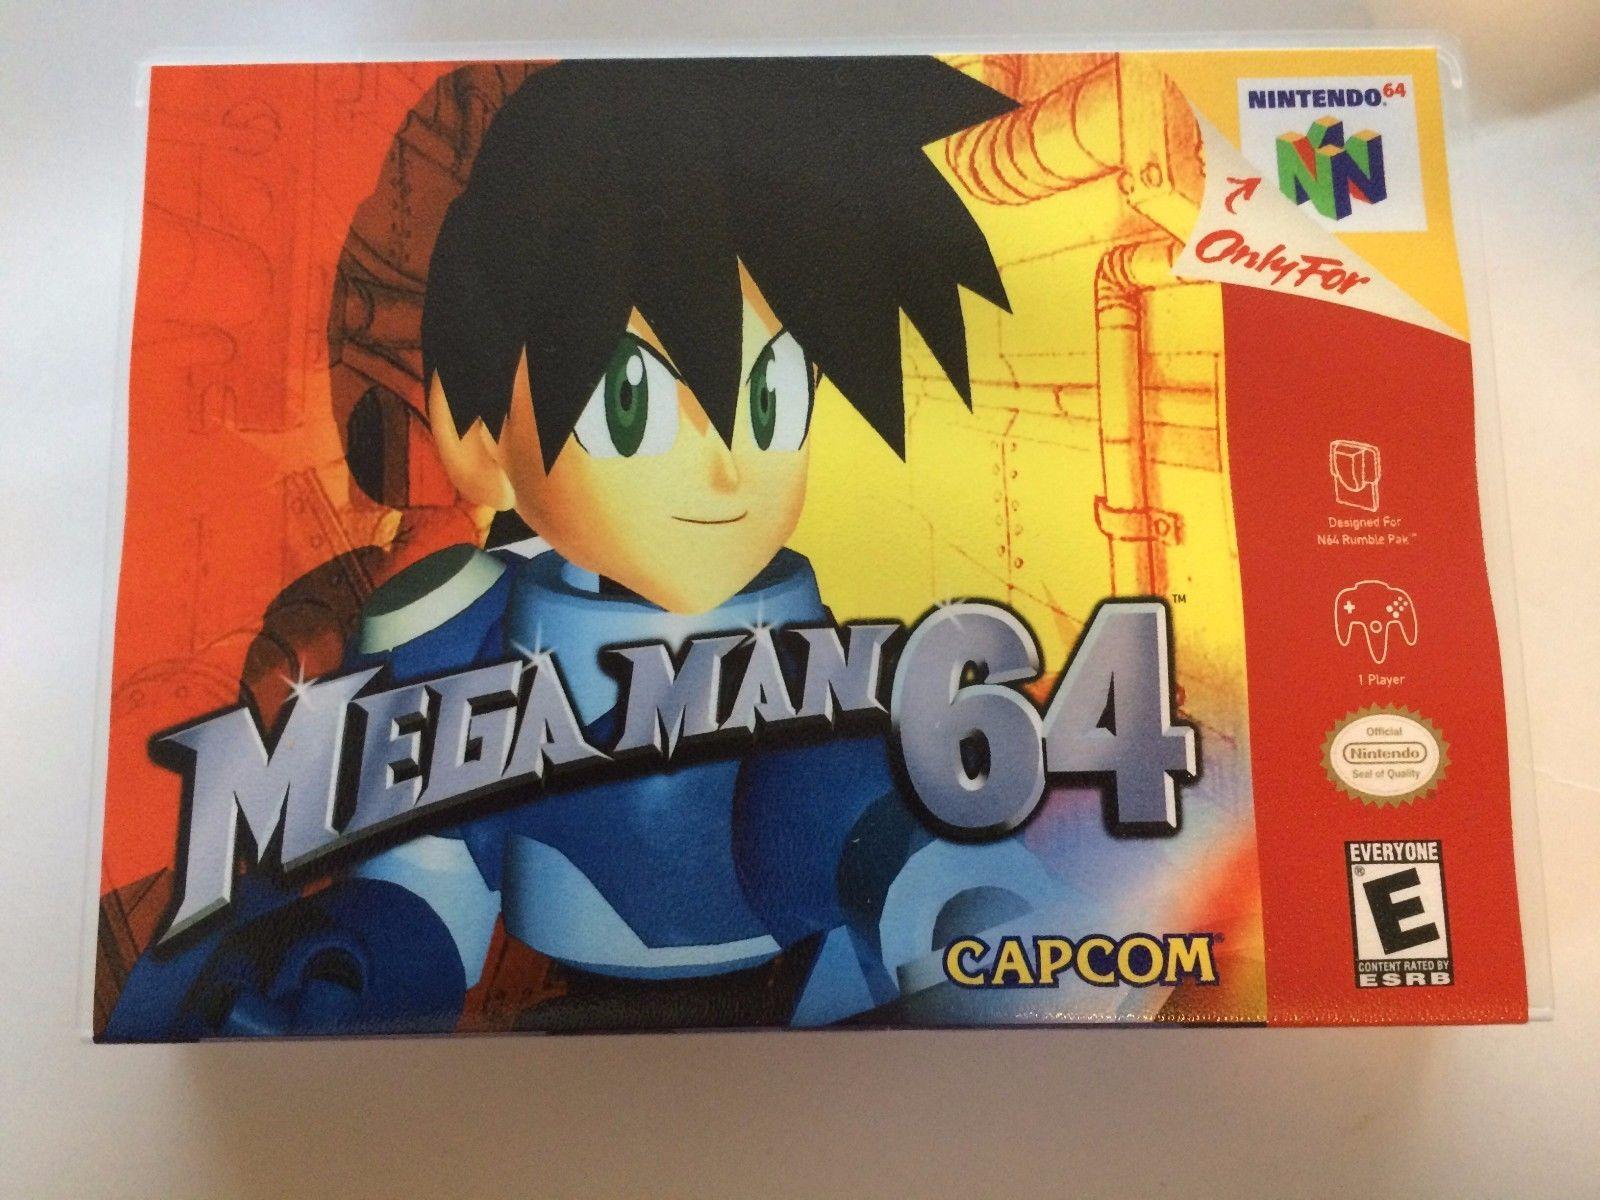 Mega Man 64 - Nintendo 64 - Replacement Case - No Game